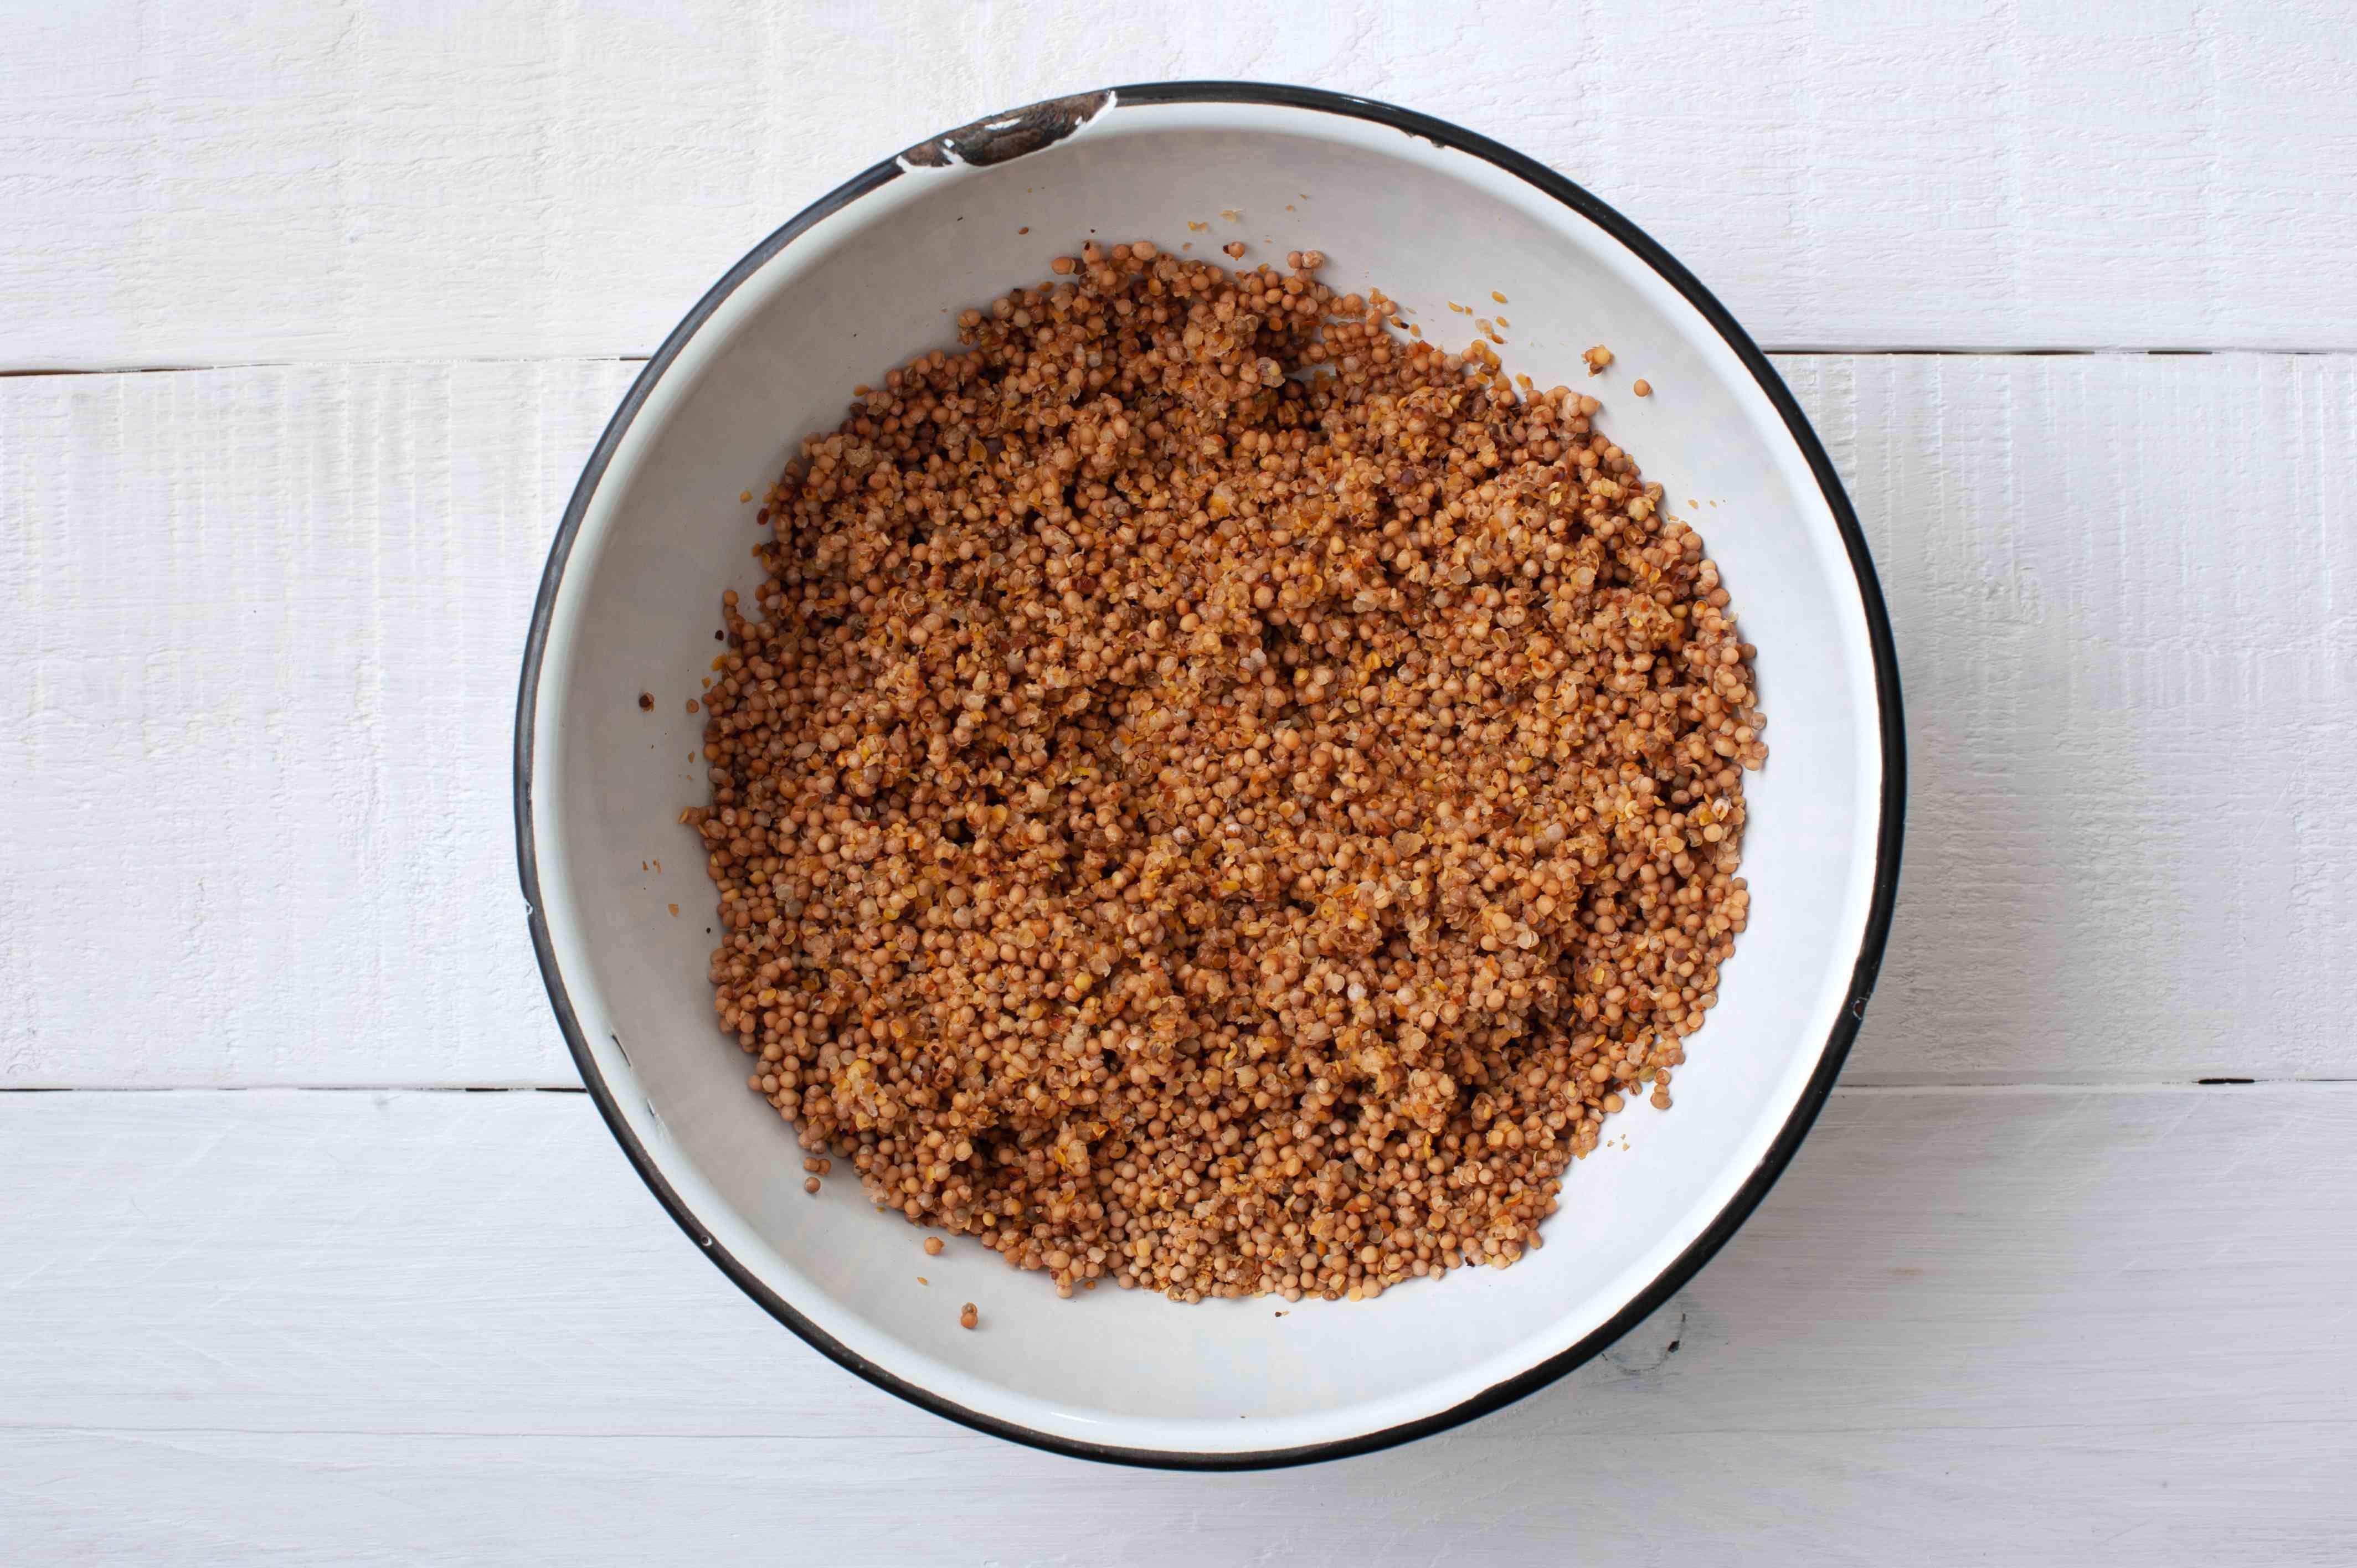 Mix mustard seeds